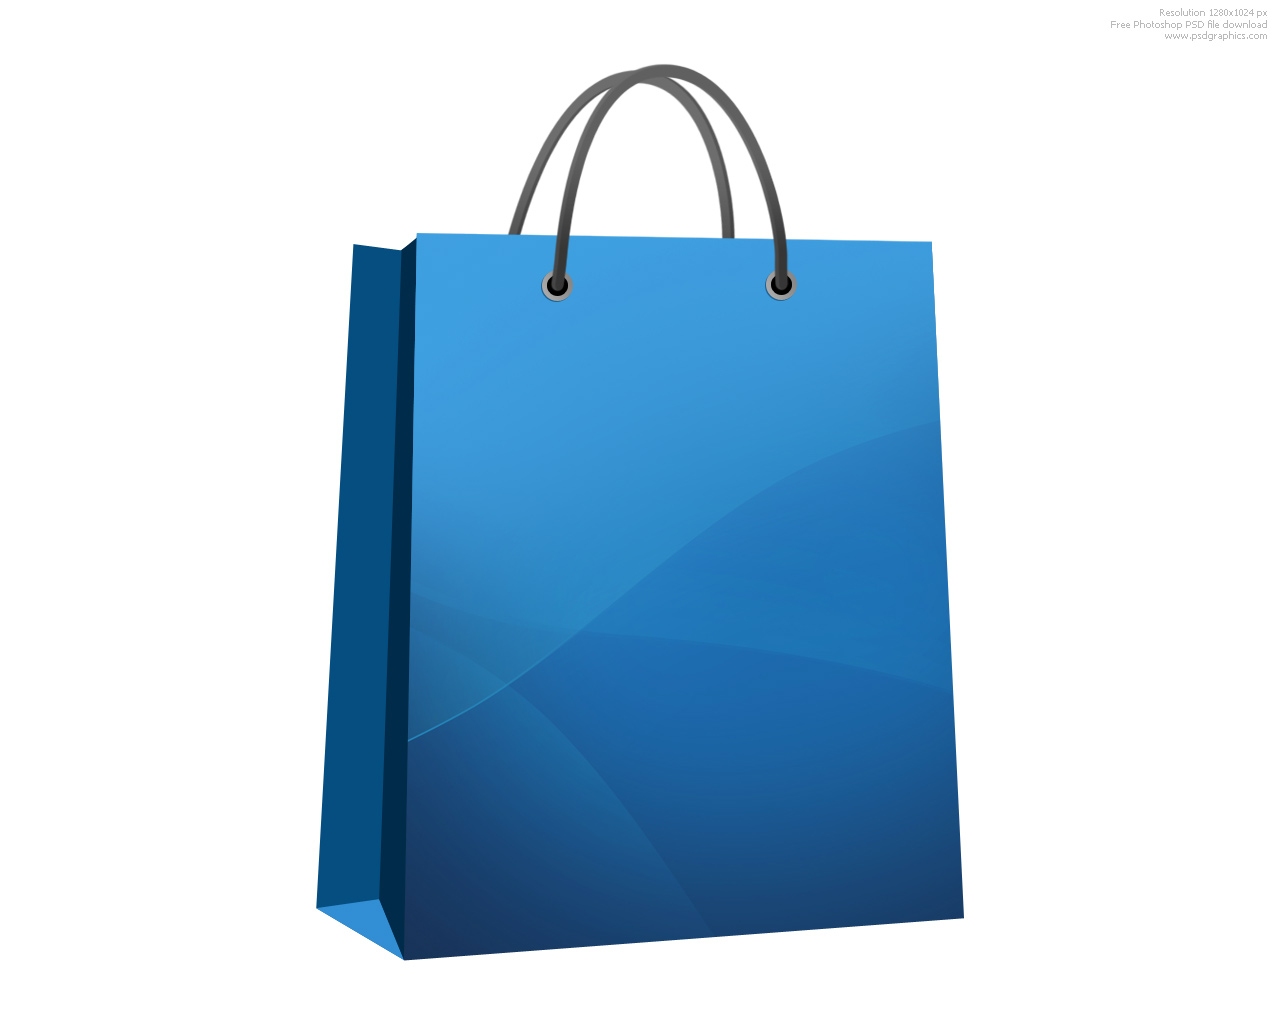 Shopping bags shopping bag clipart 5